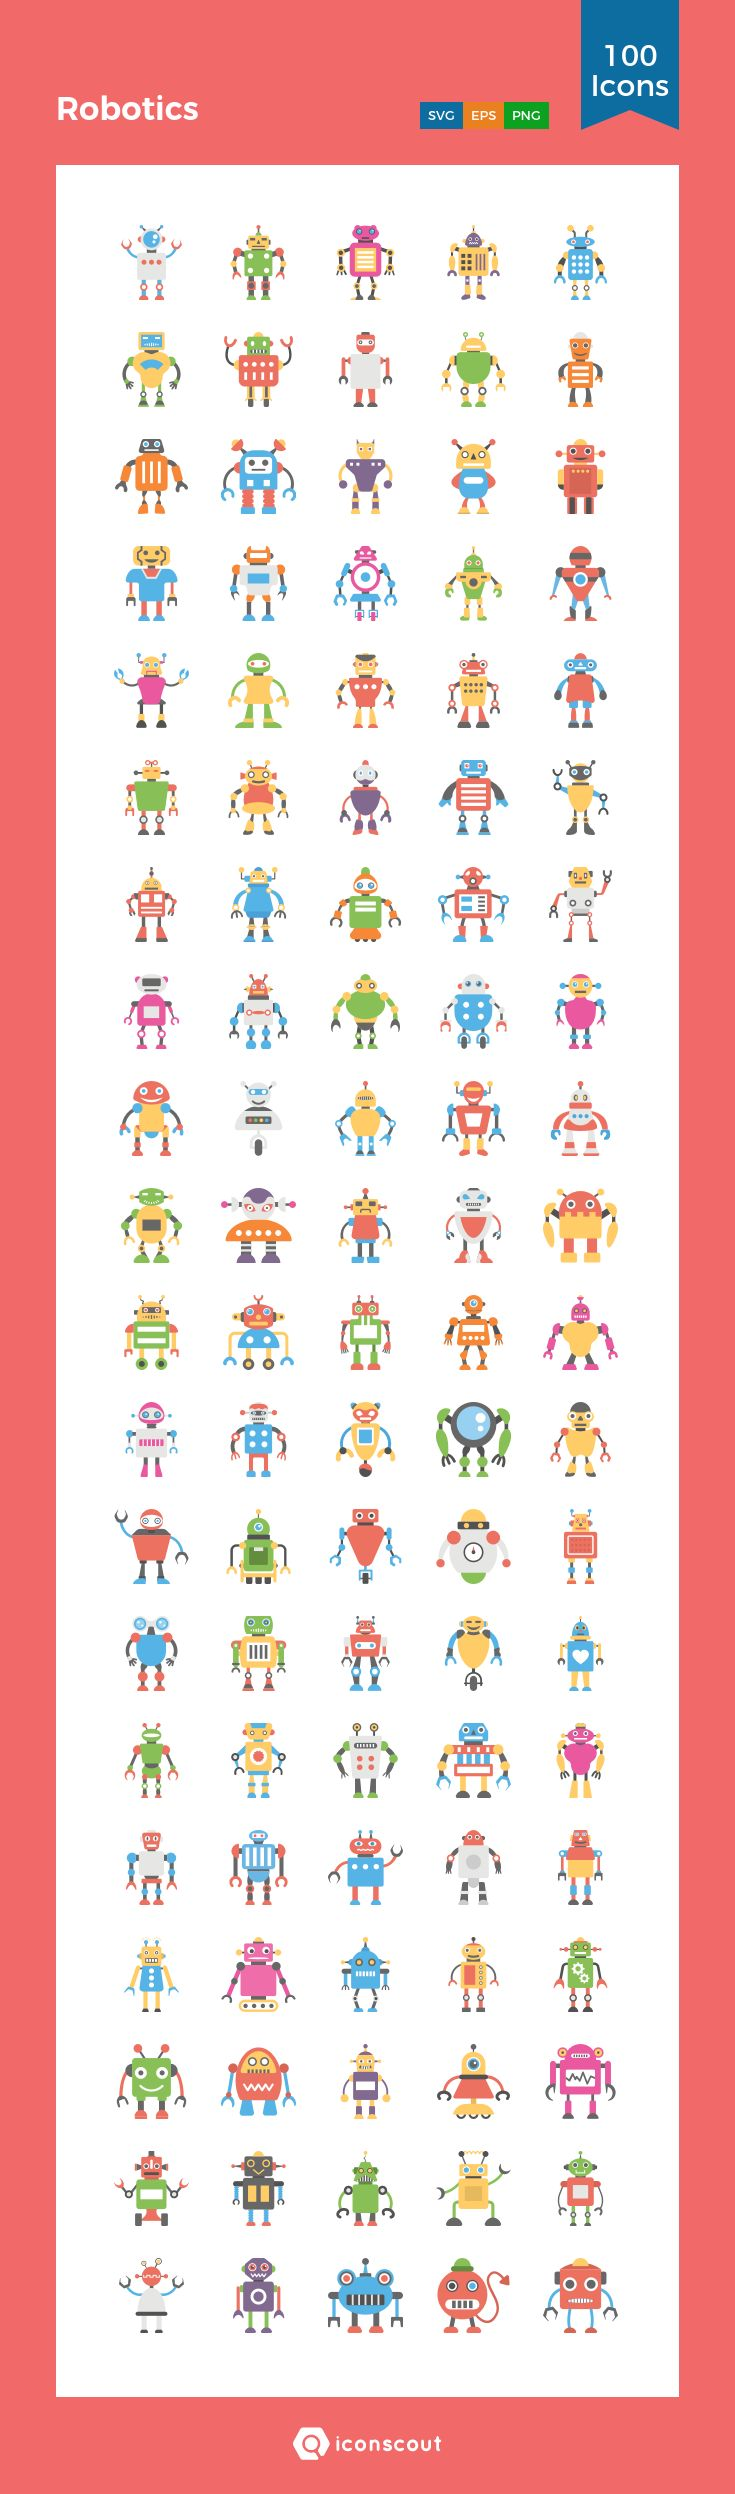 Robotics   Icon Pack - 100 Flat Icons